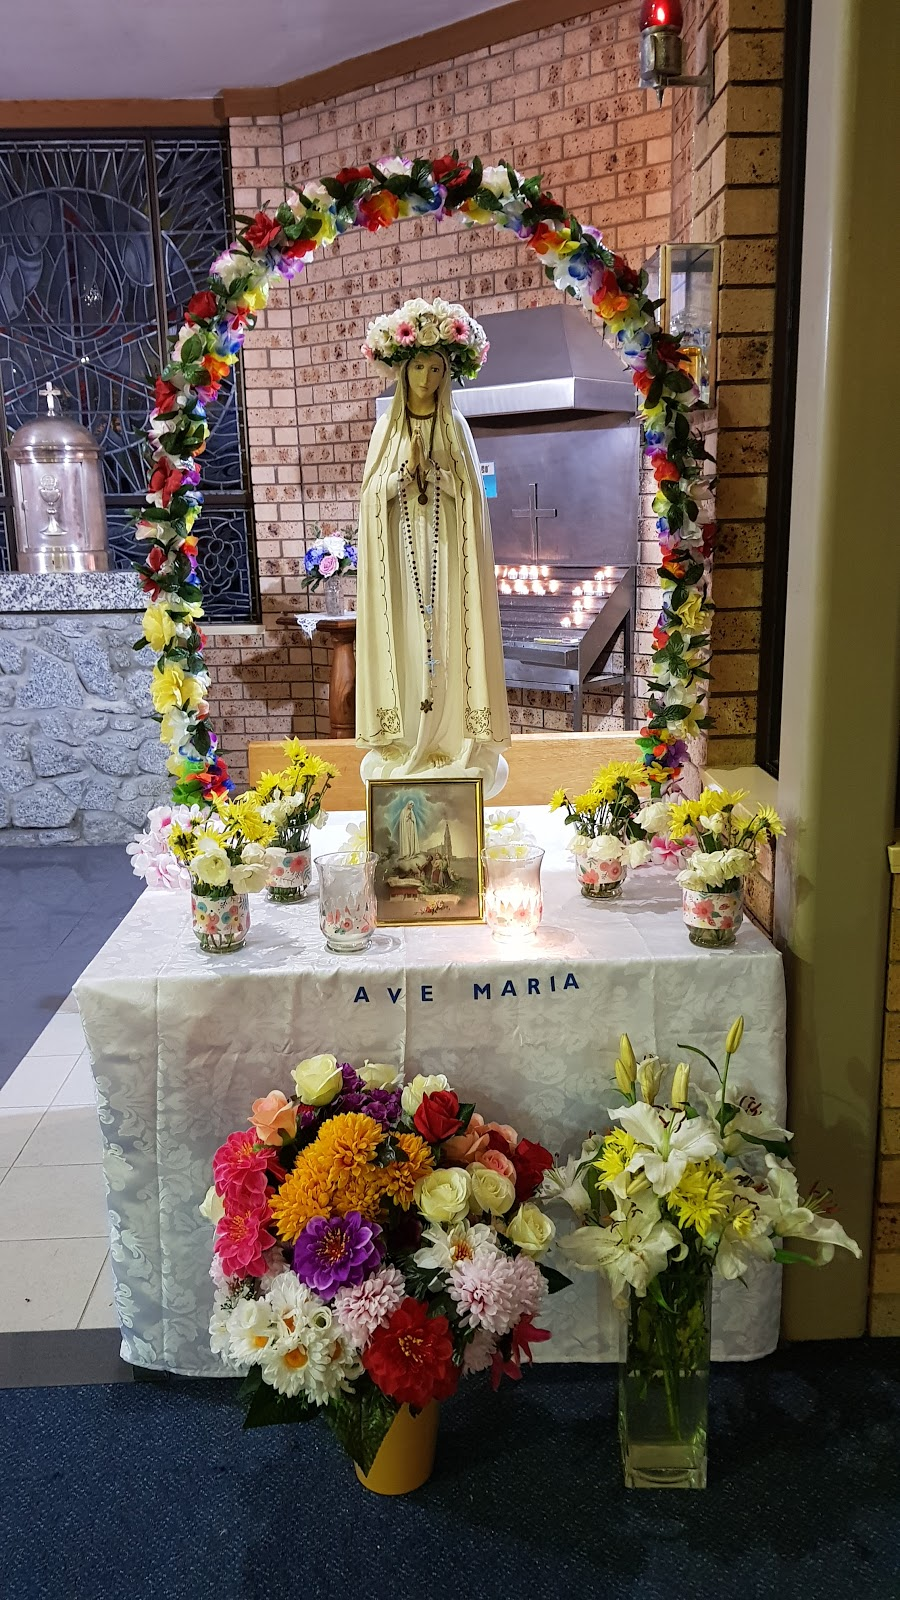 Saint Bernards Catholic Church | church | 2 David Ave, Batehaven NSW 2536, Australia | 0244724153 OR +61 2 4472 4153